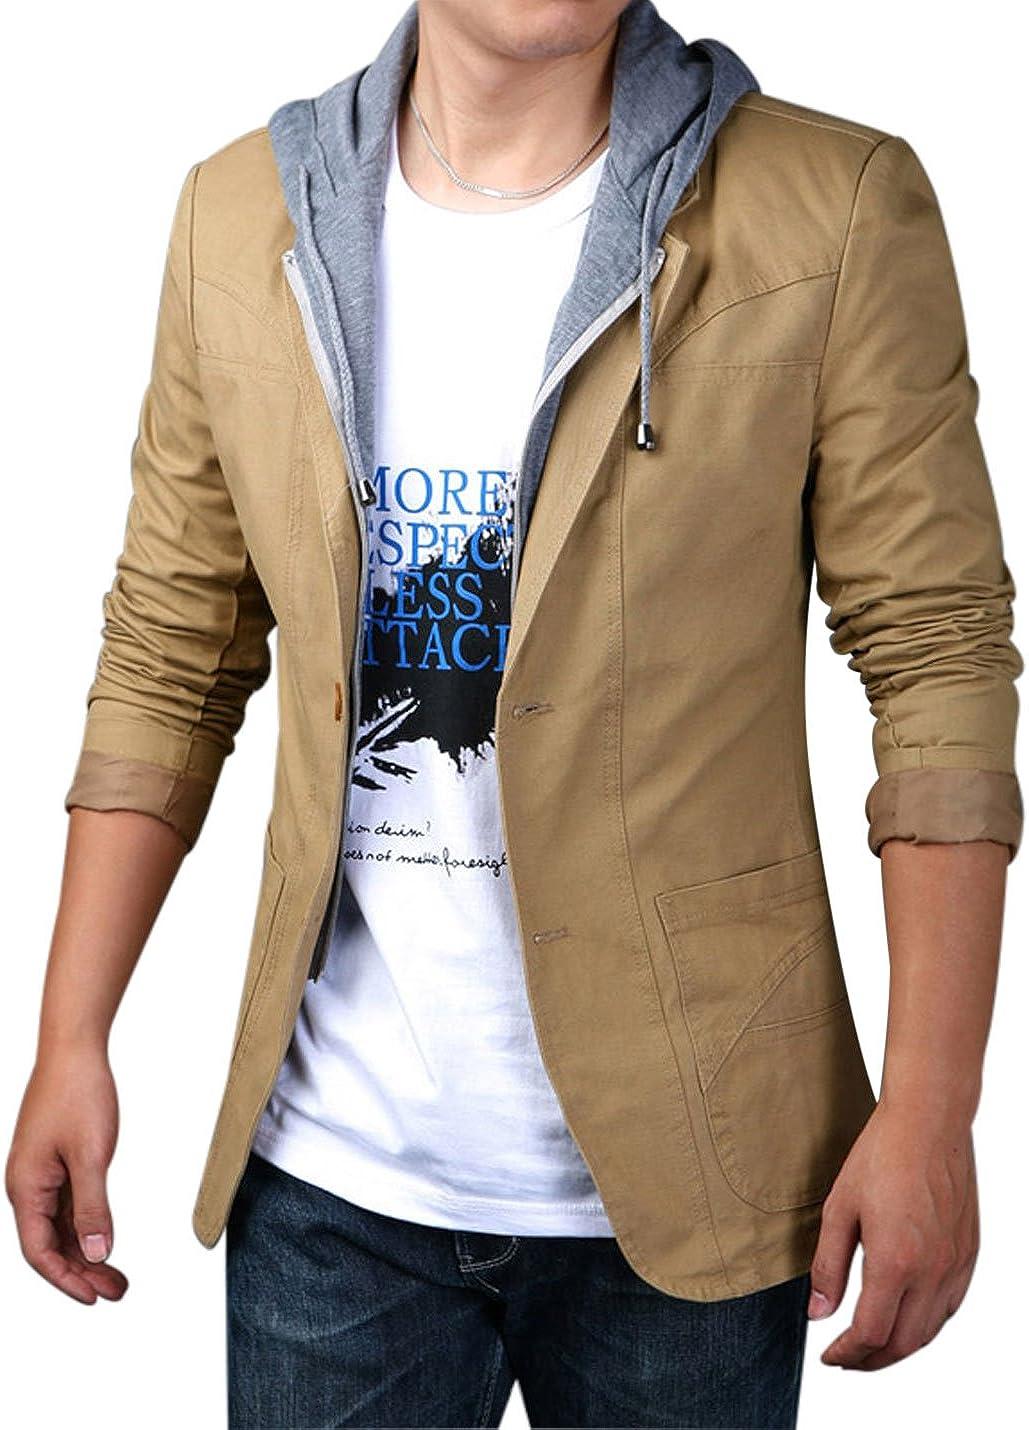 Yeokou Men's Casual Cotton Slim Two Buttons Hoodie Suit Jacket Blazer Sport Coat